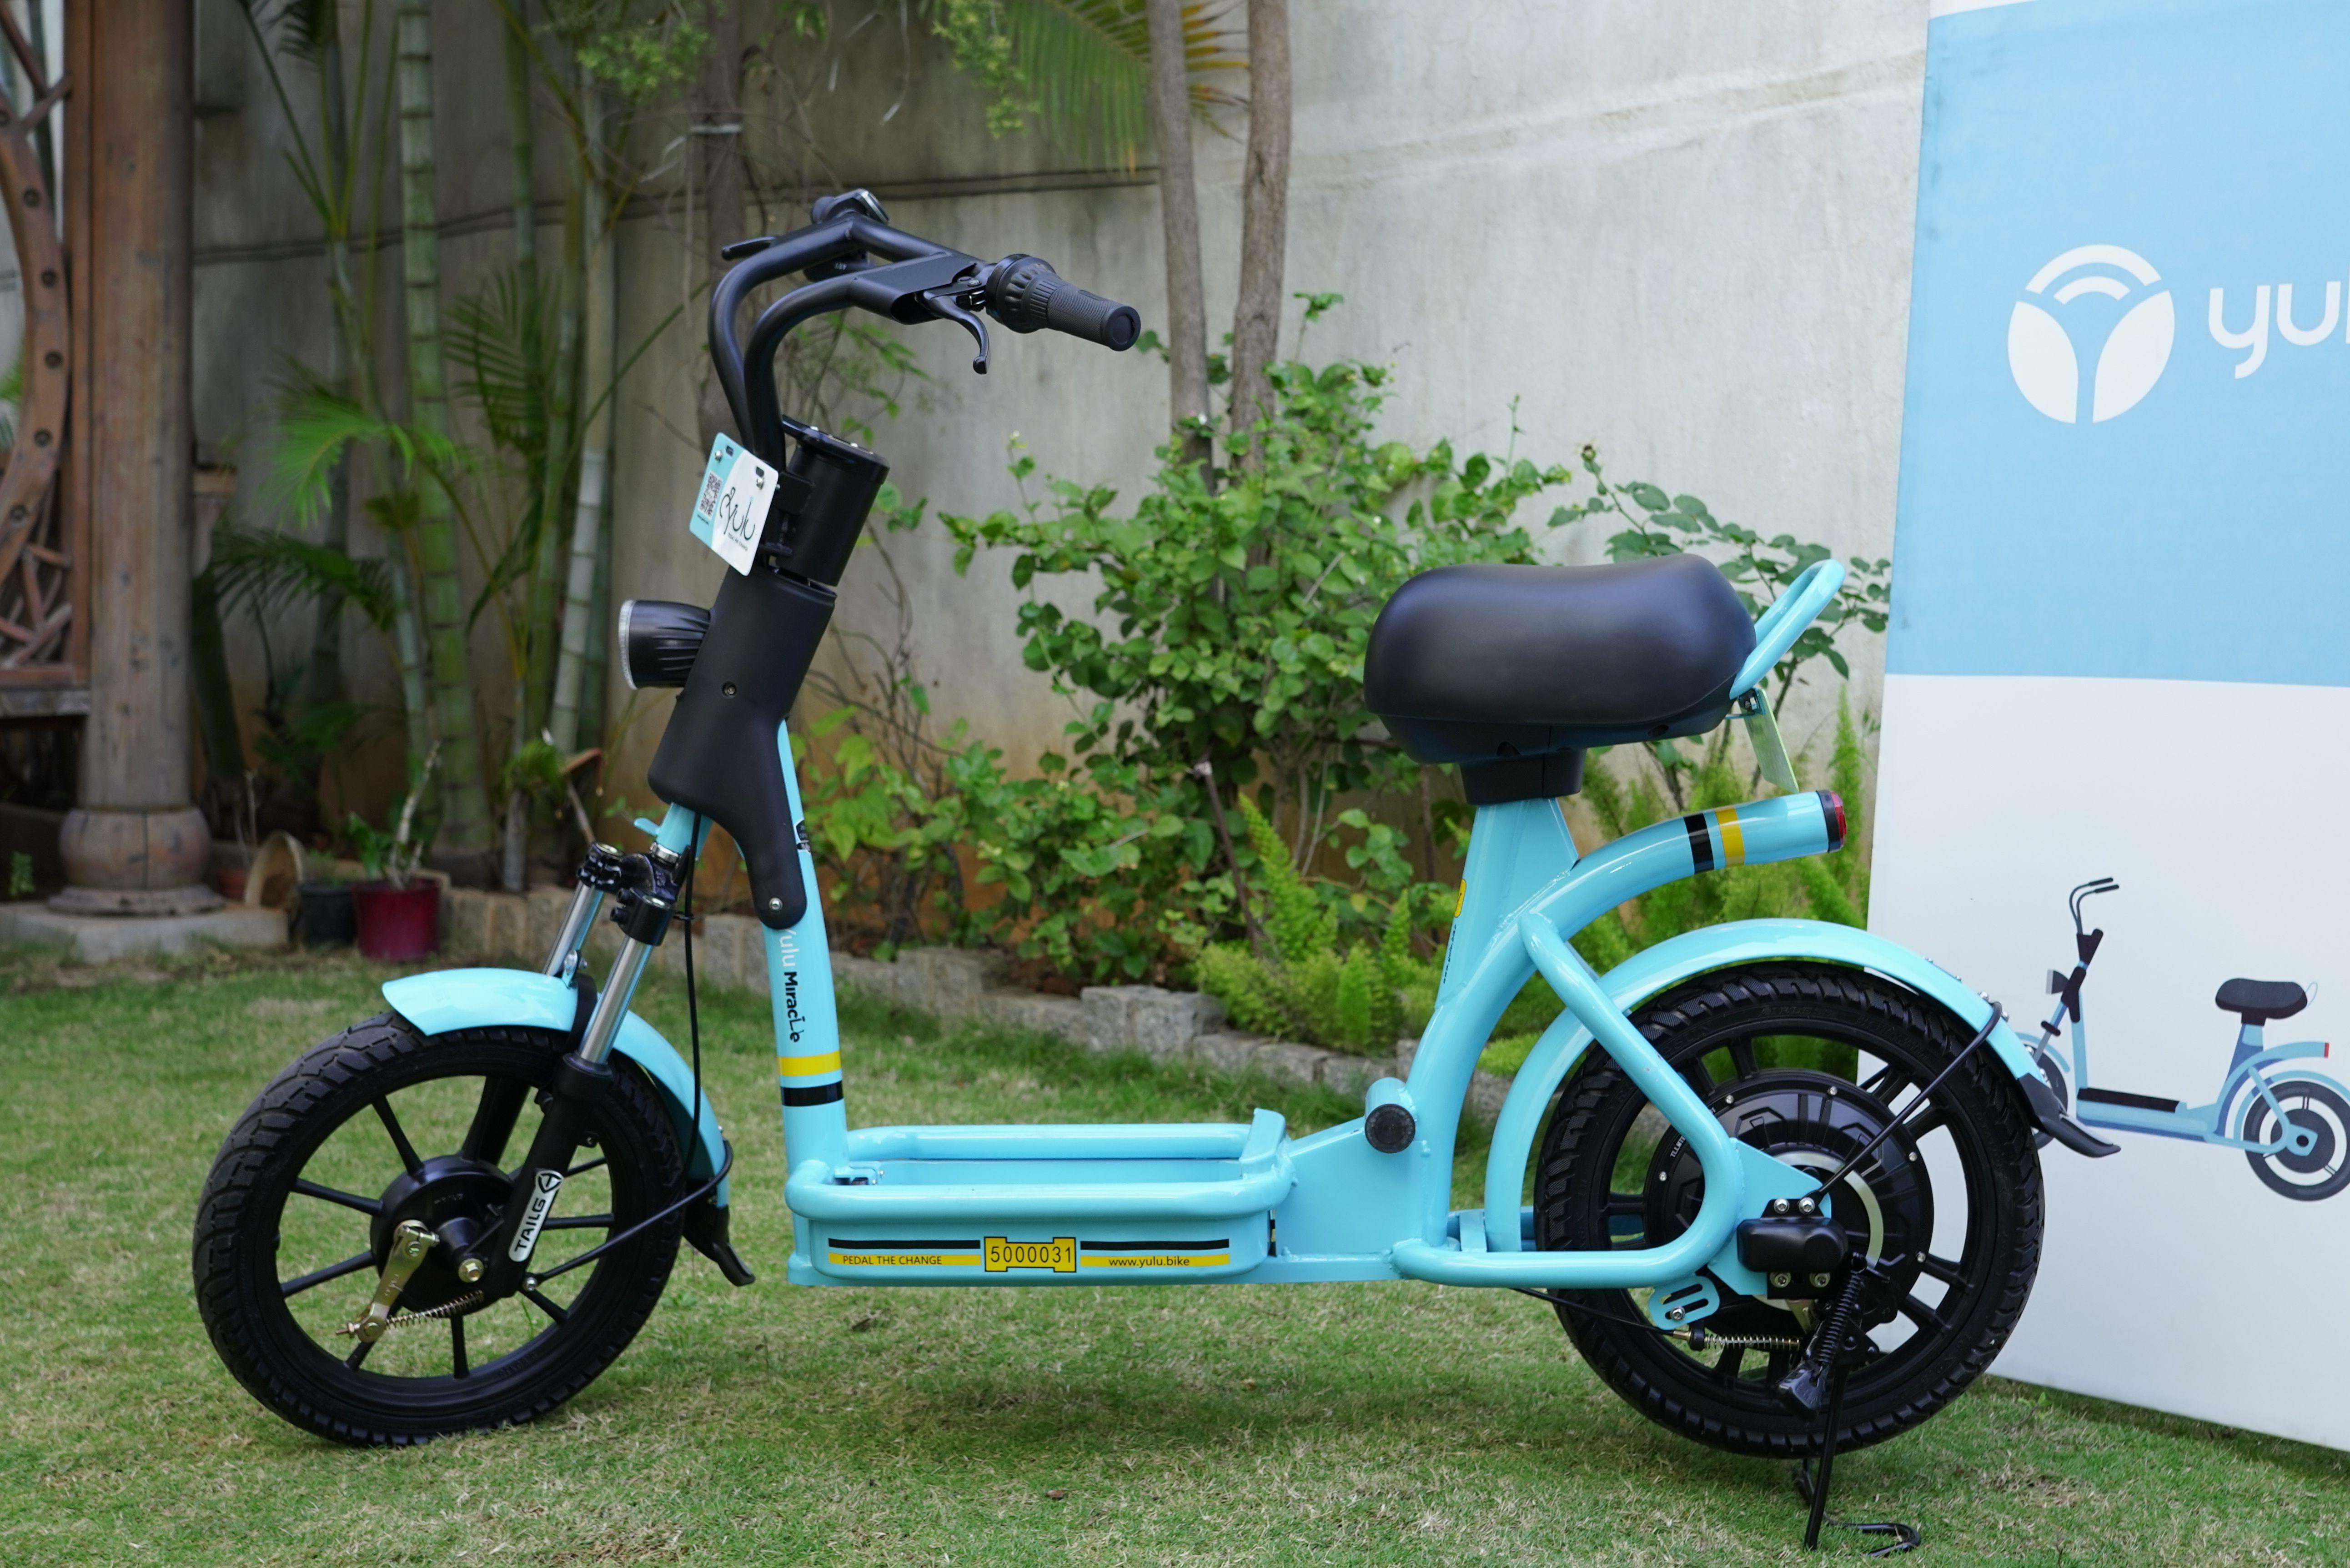 Yulu Ride The Change Digital India Digital Wallet Riding